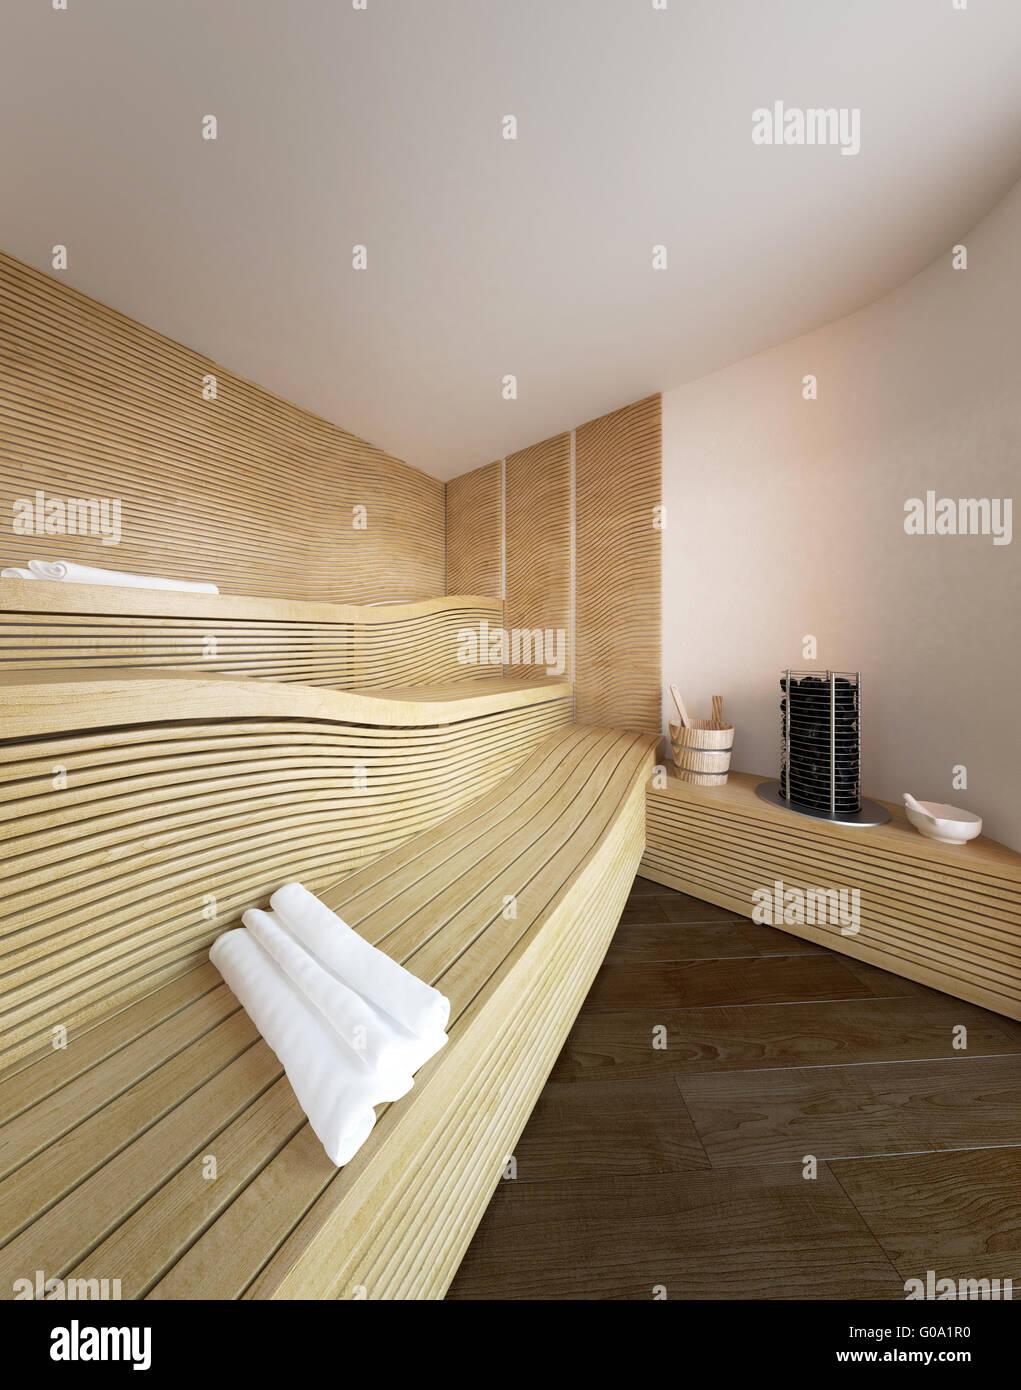 Luxury Home Sauna Cedardirect Com: Architectural Interior Of Modern Sauna In Luxury Home With